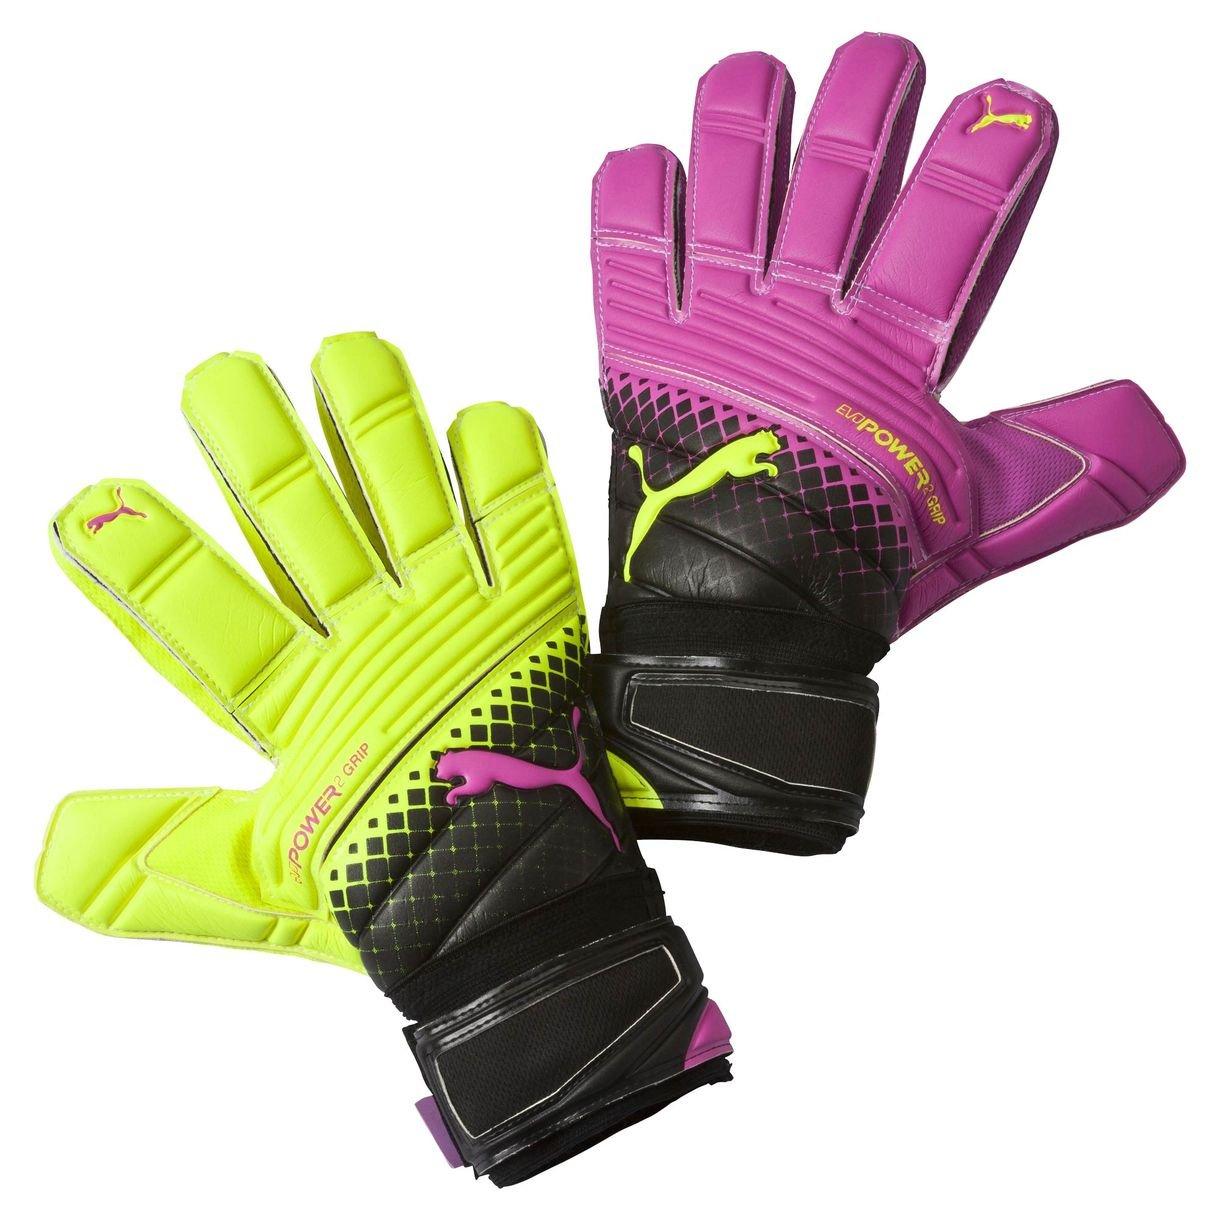 Brankářské rukavice Puma evoPOWER Grip 2.3 RC pink glo-safety yel